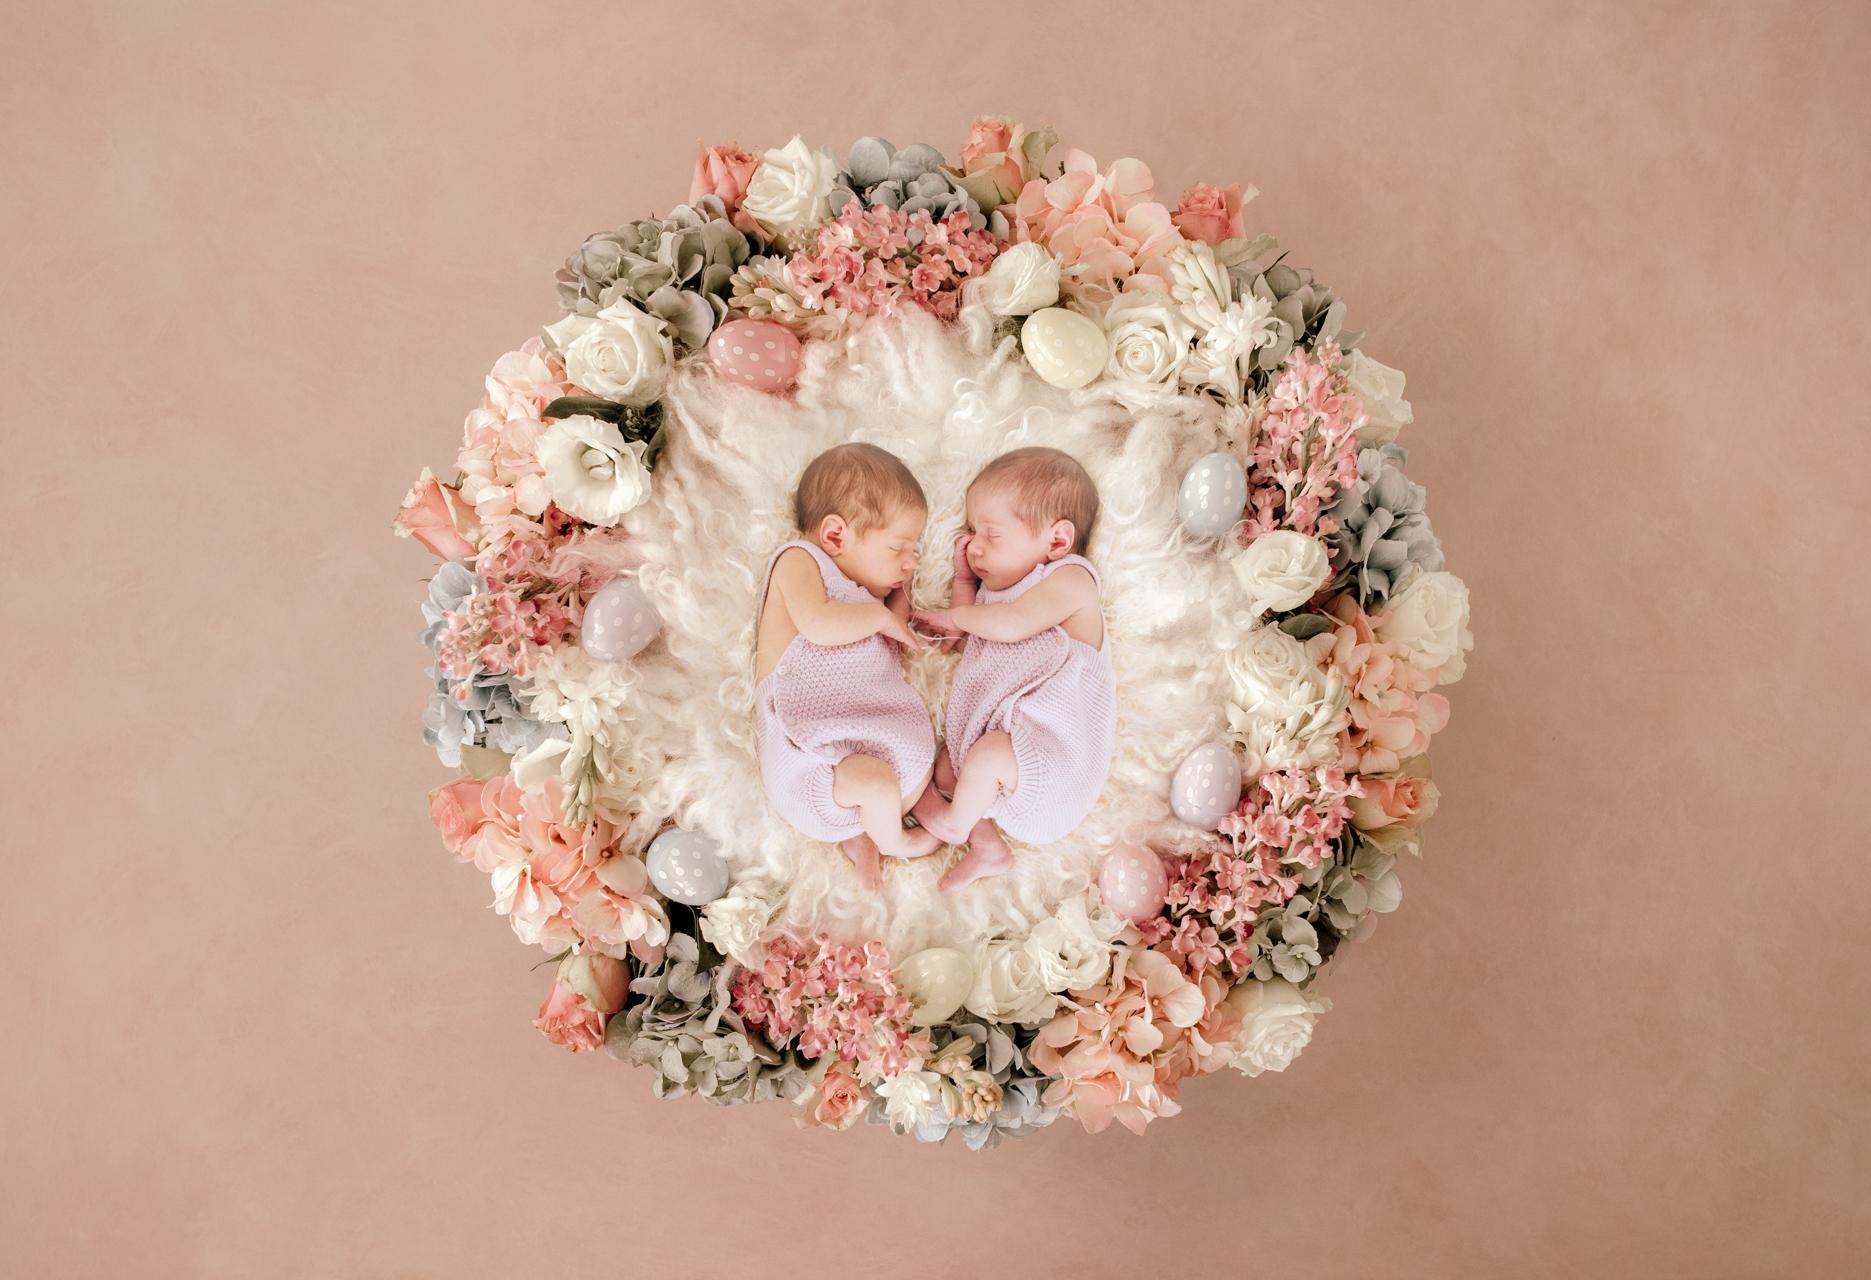 Fotografias de recién nacidos Donostia san sebastian